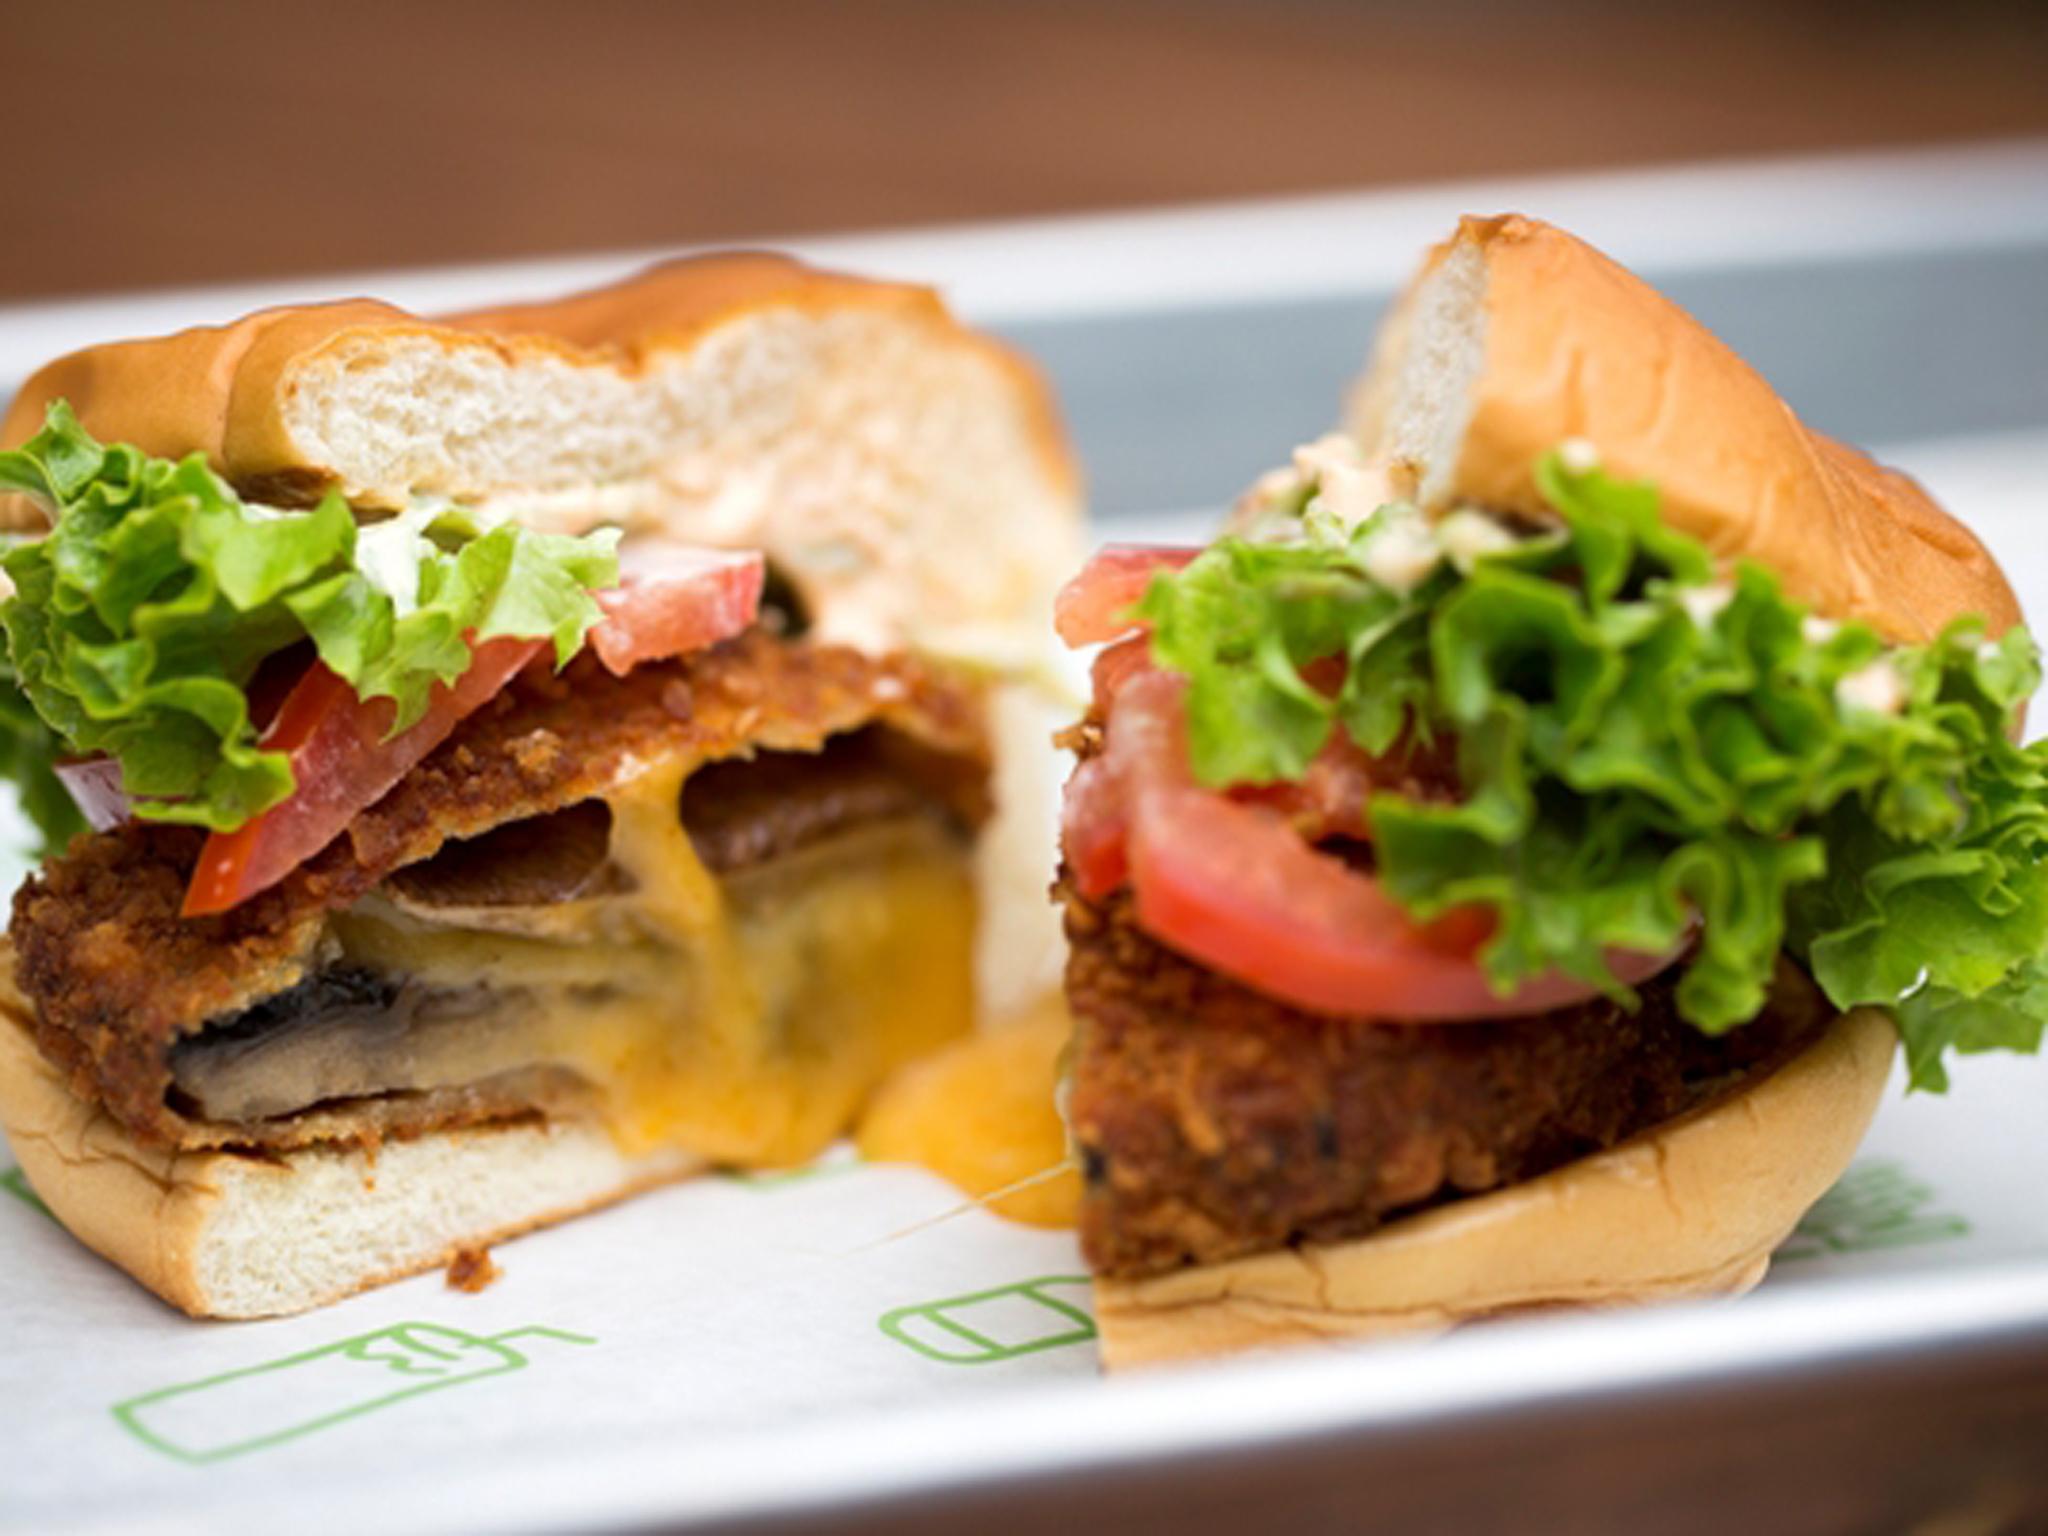 best veggie burgers in london, shake shack shroom burger